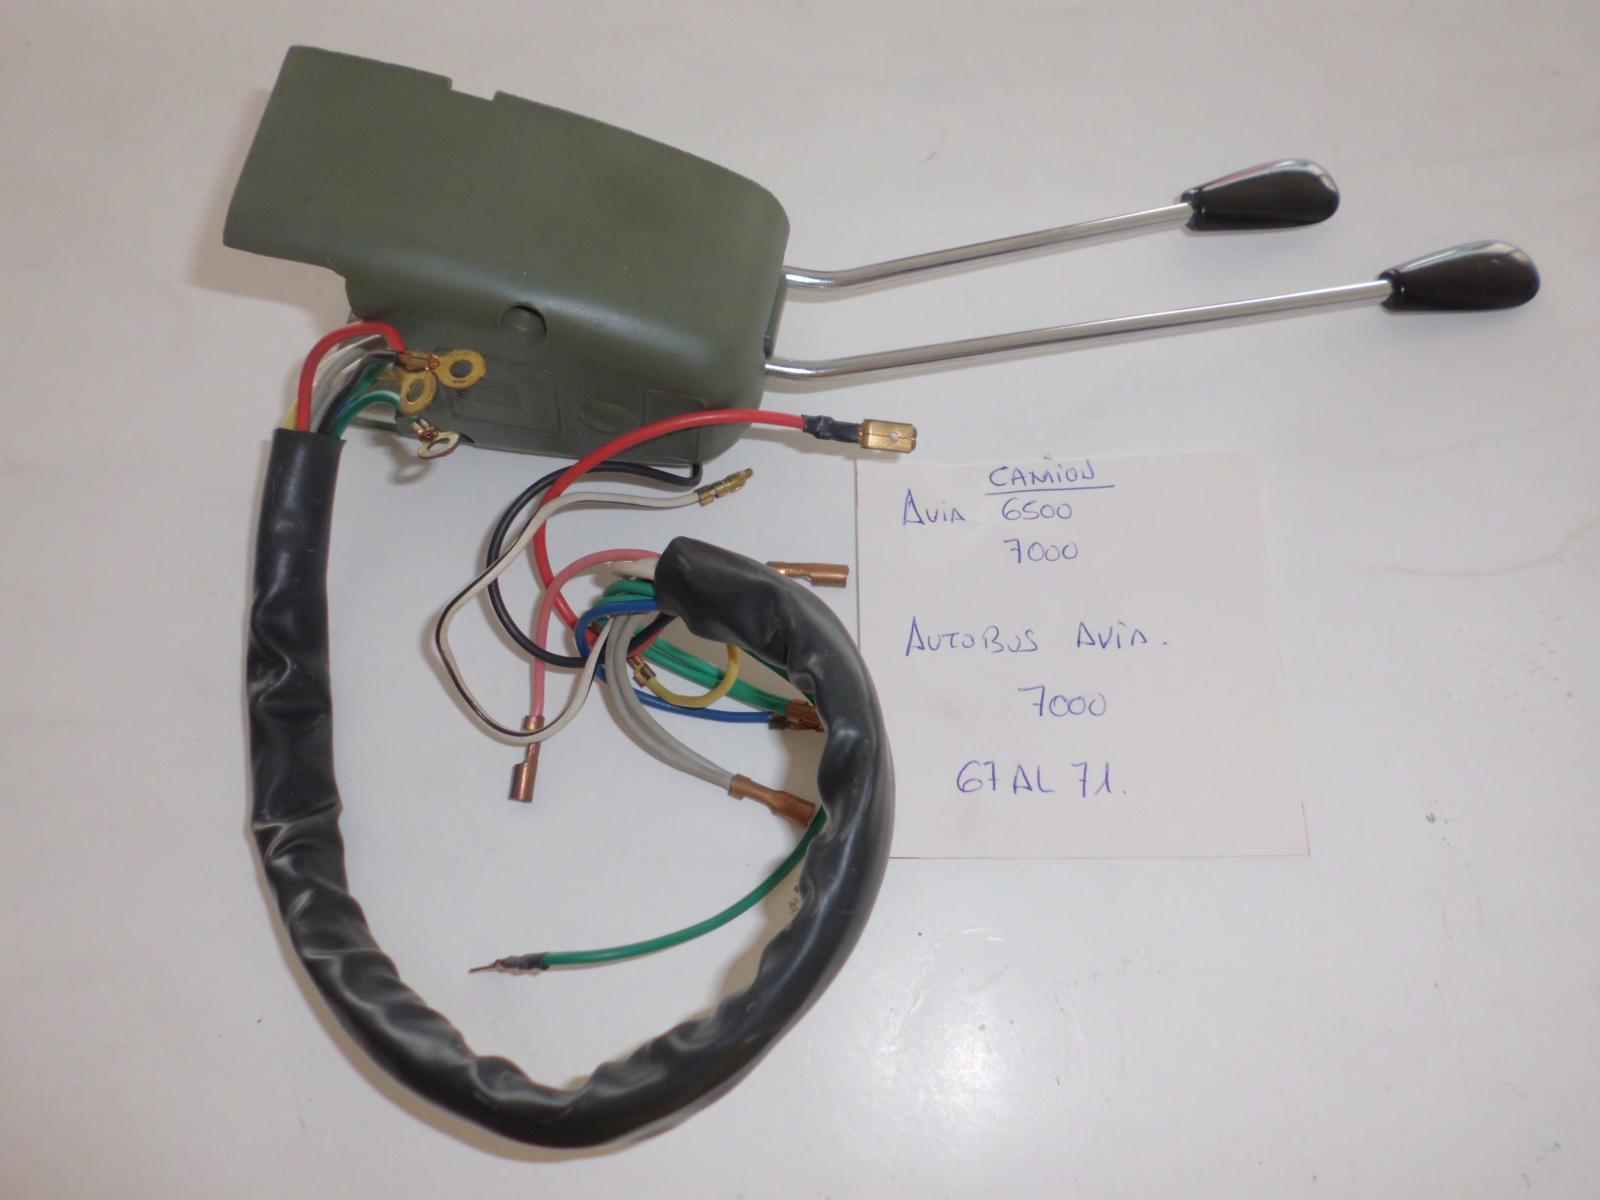 Conmutador de luces de Avia 6500 y Avia 7000